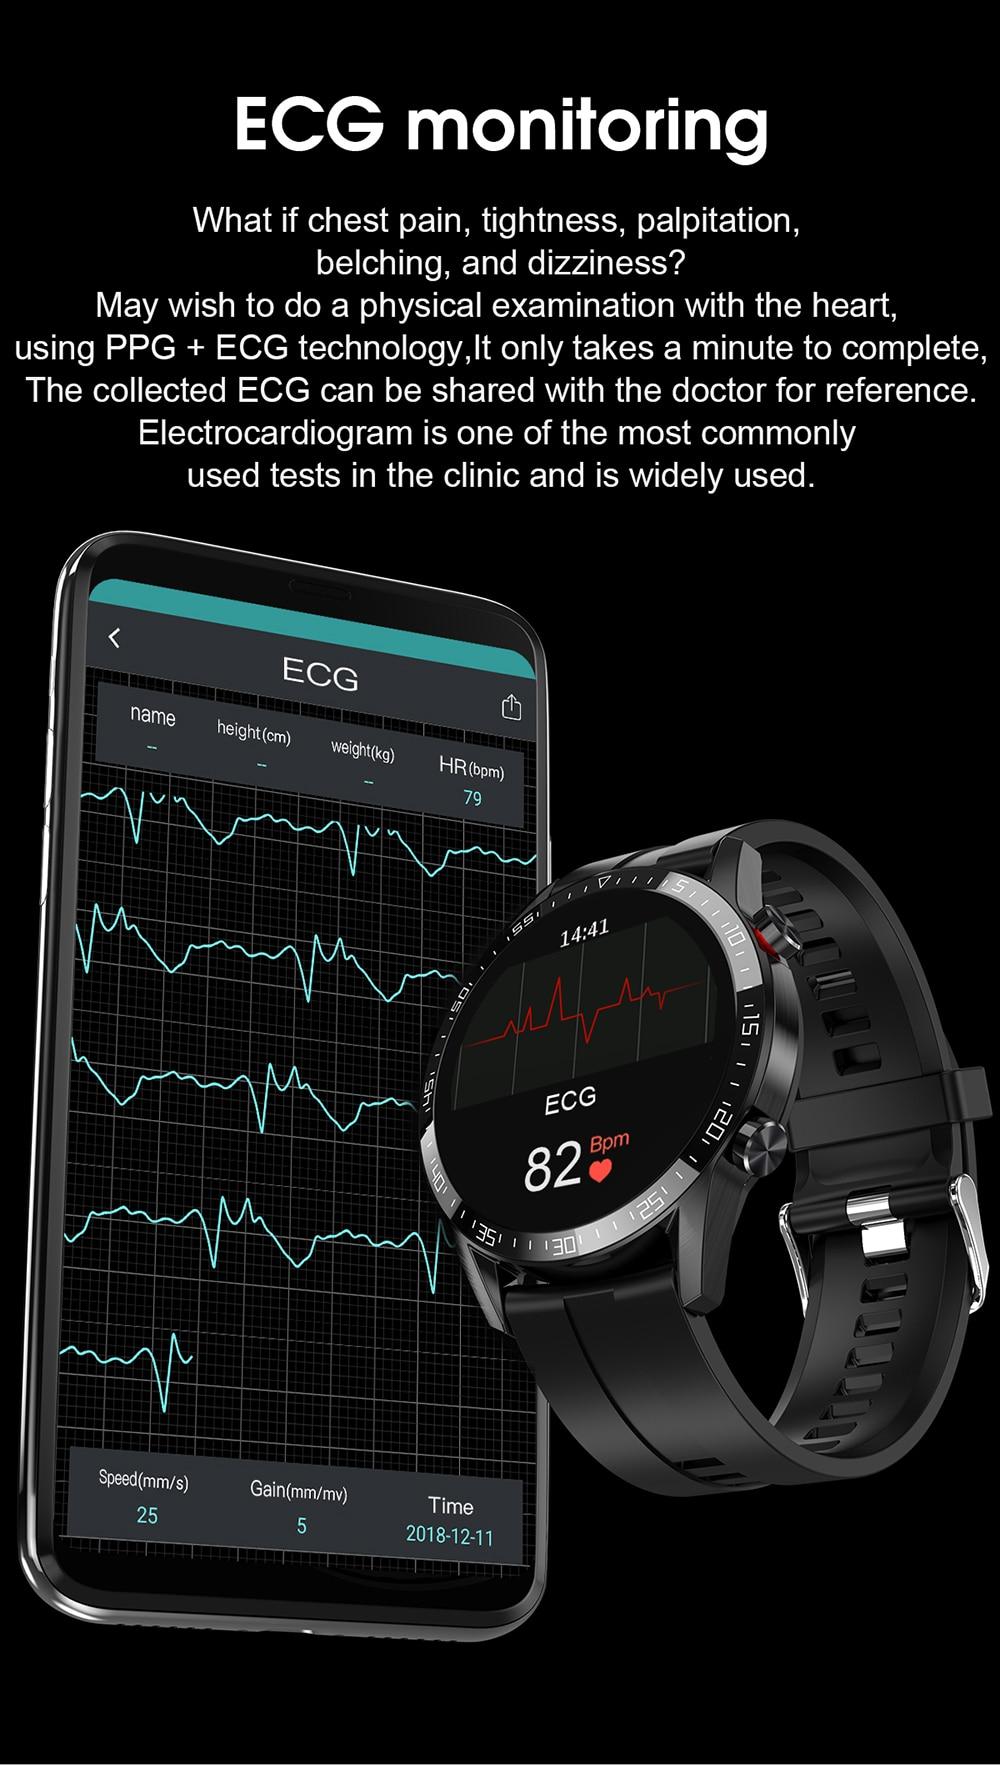 H52be1ec75edb4b1b883ac46cc9c89dffi For Phone Xiaomi Android IOS Reloj Inteligente Hombre Smartwatch Men 2021 Android IP68 Smartwatch Answer Call Smart Watch Man